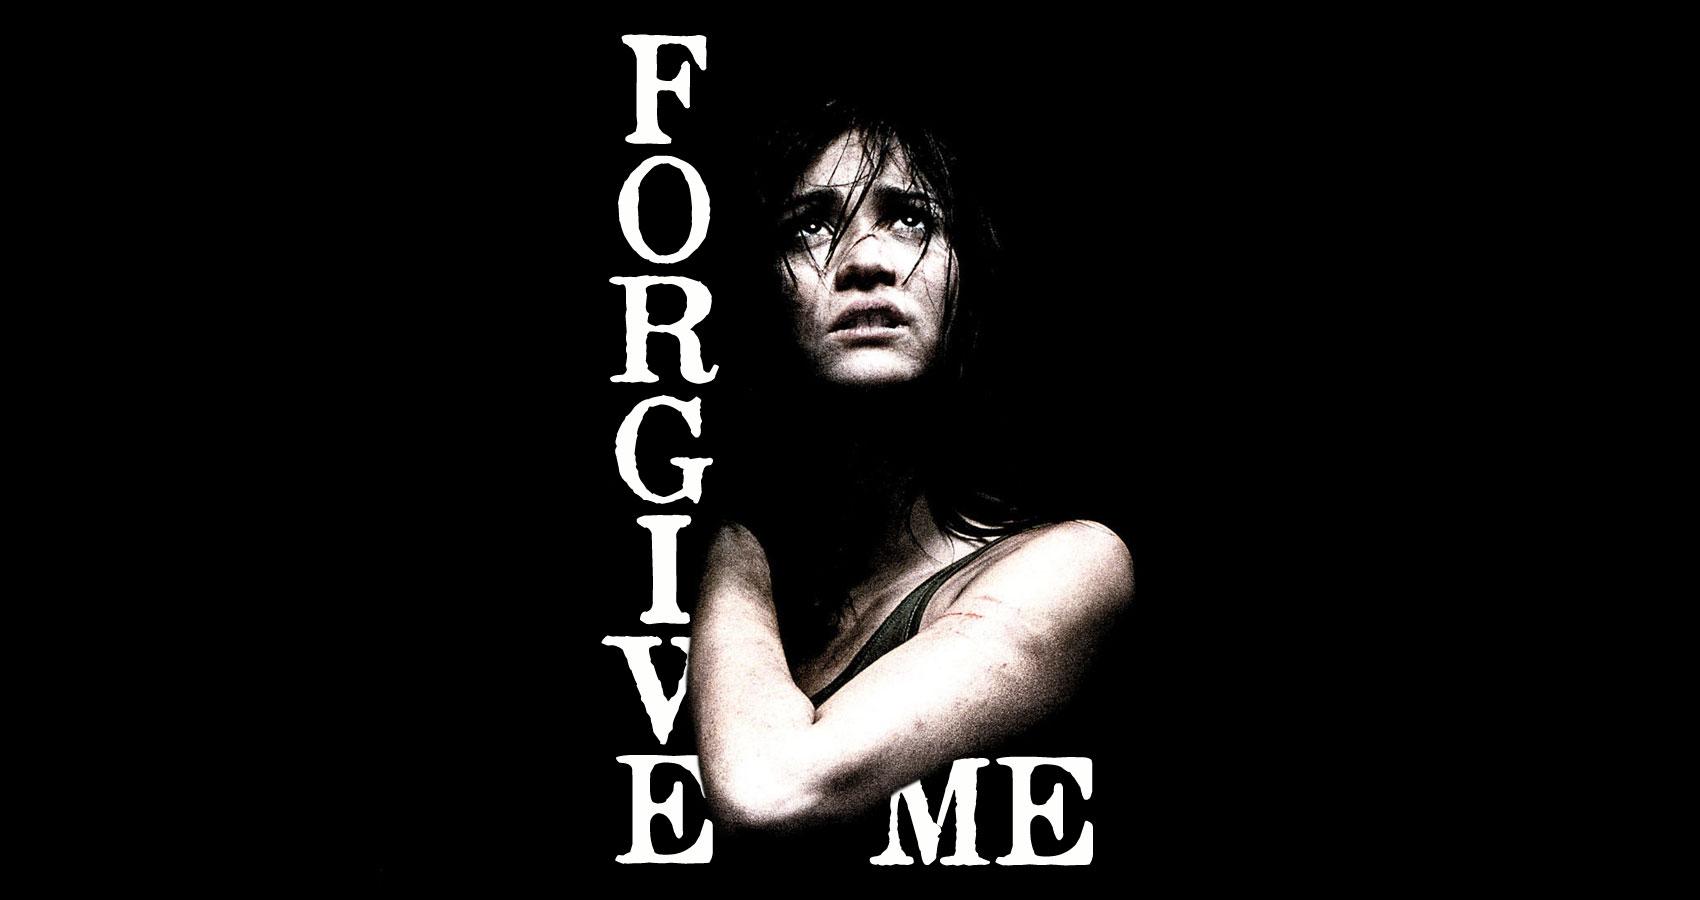 Forgive Me by Jenn Hope at Spillwords.com